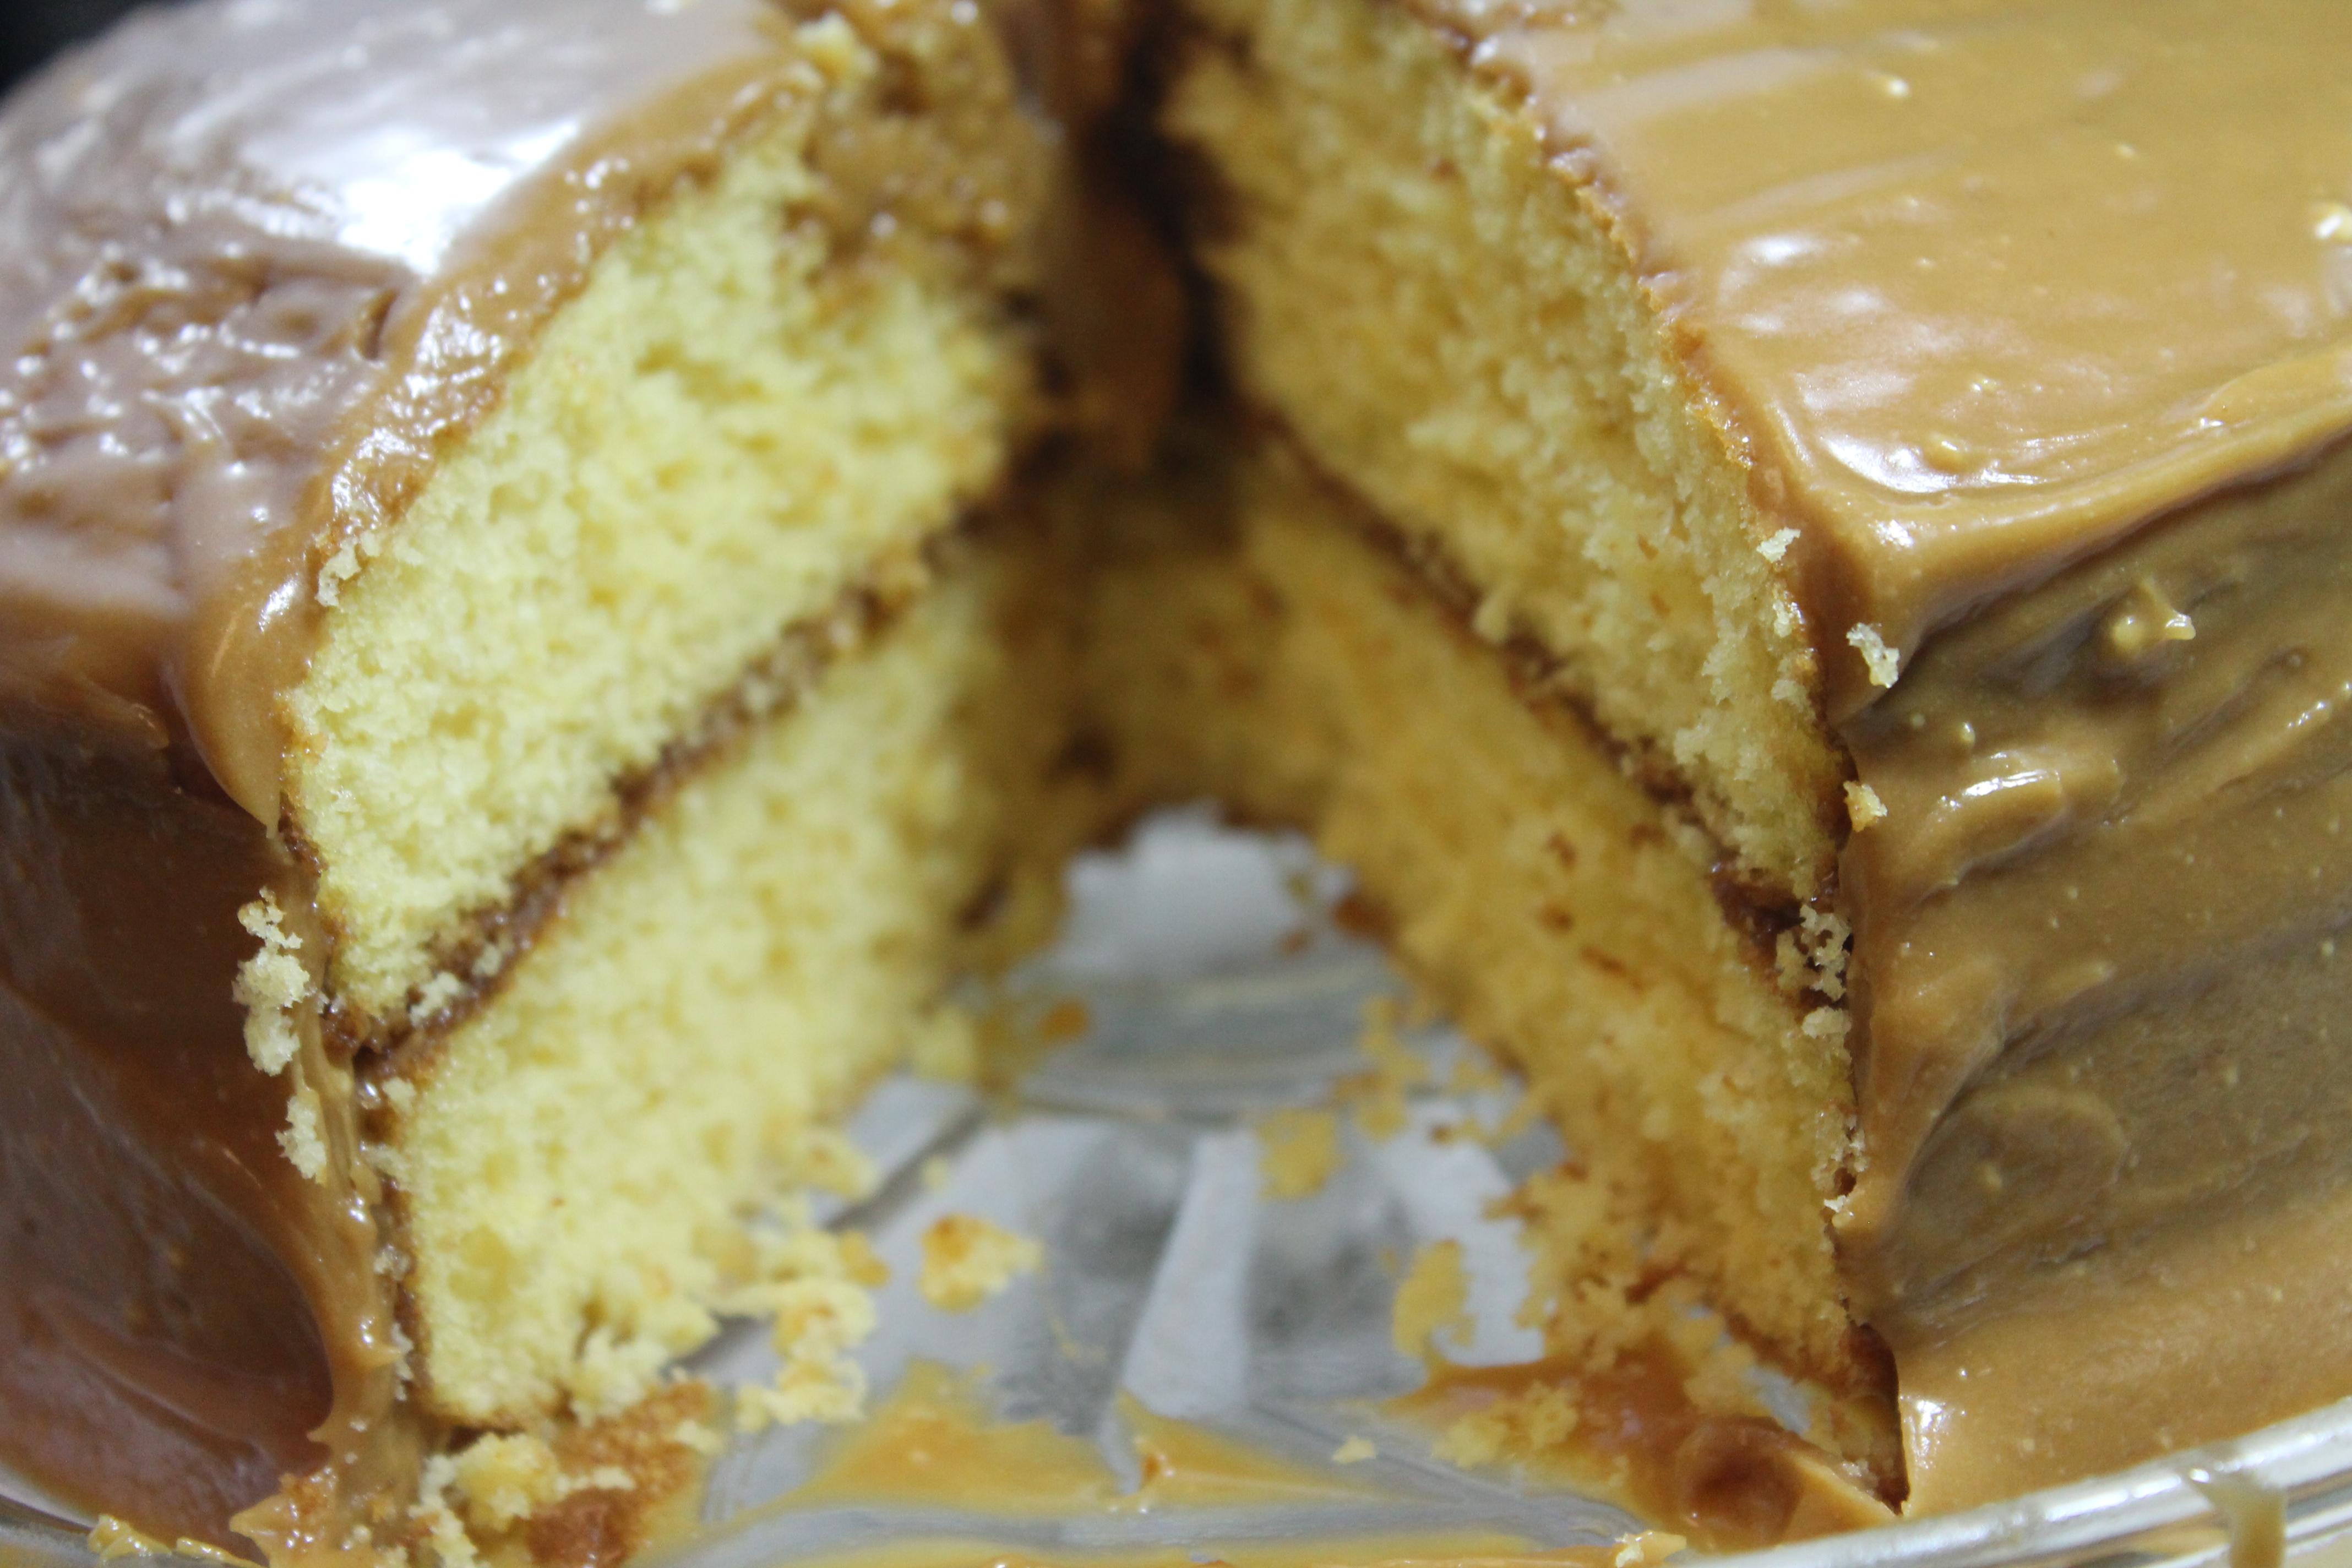 Southern Caramel Cak